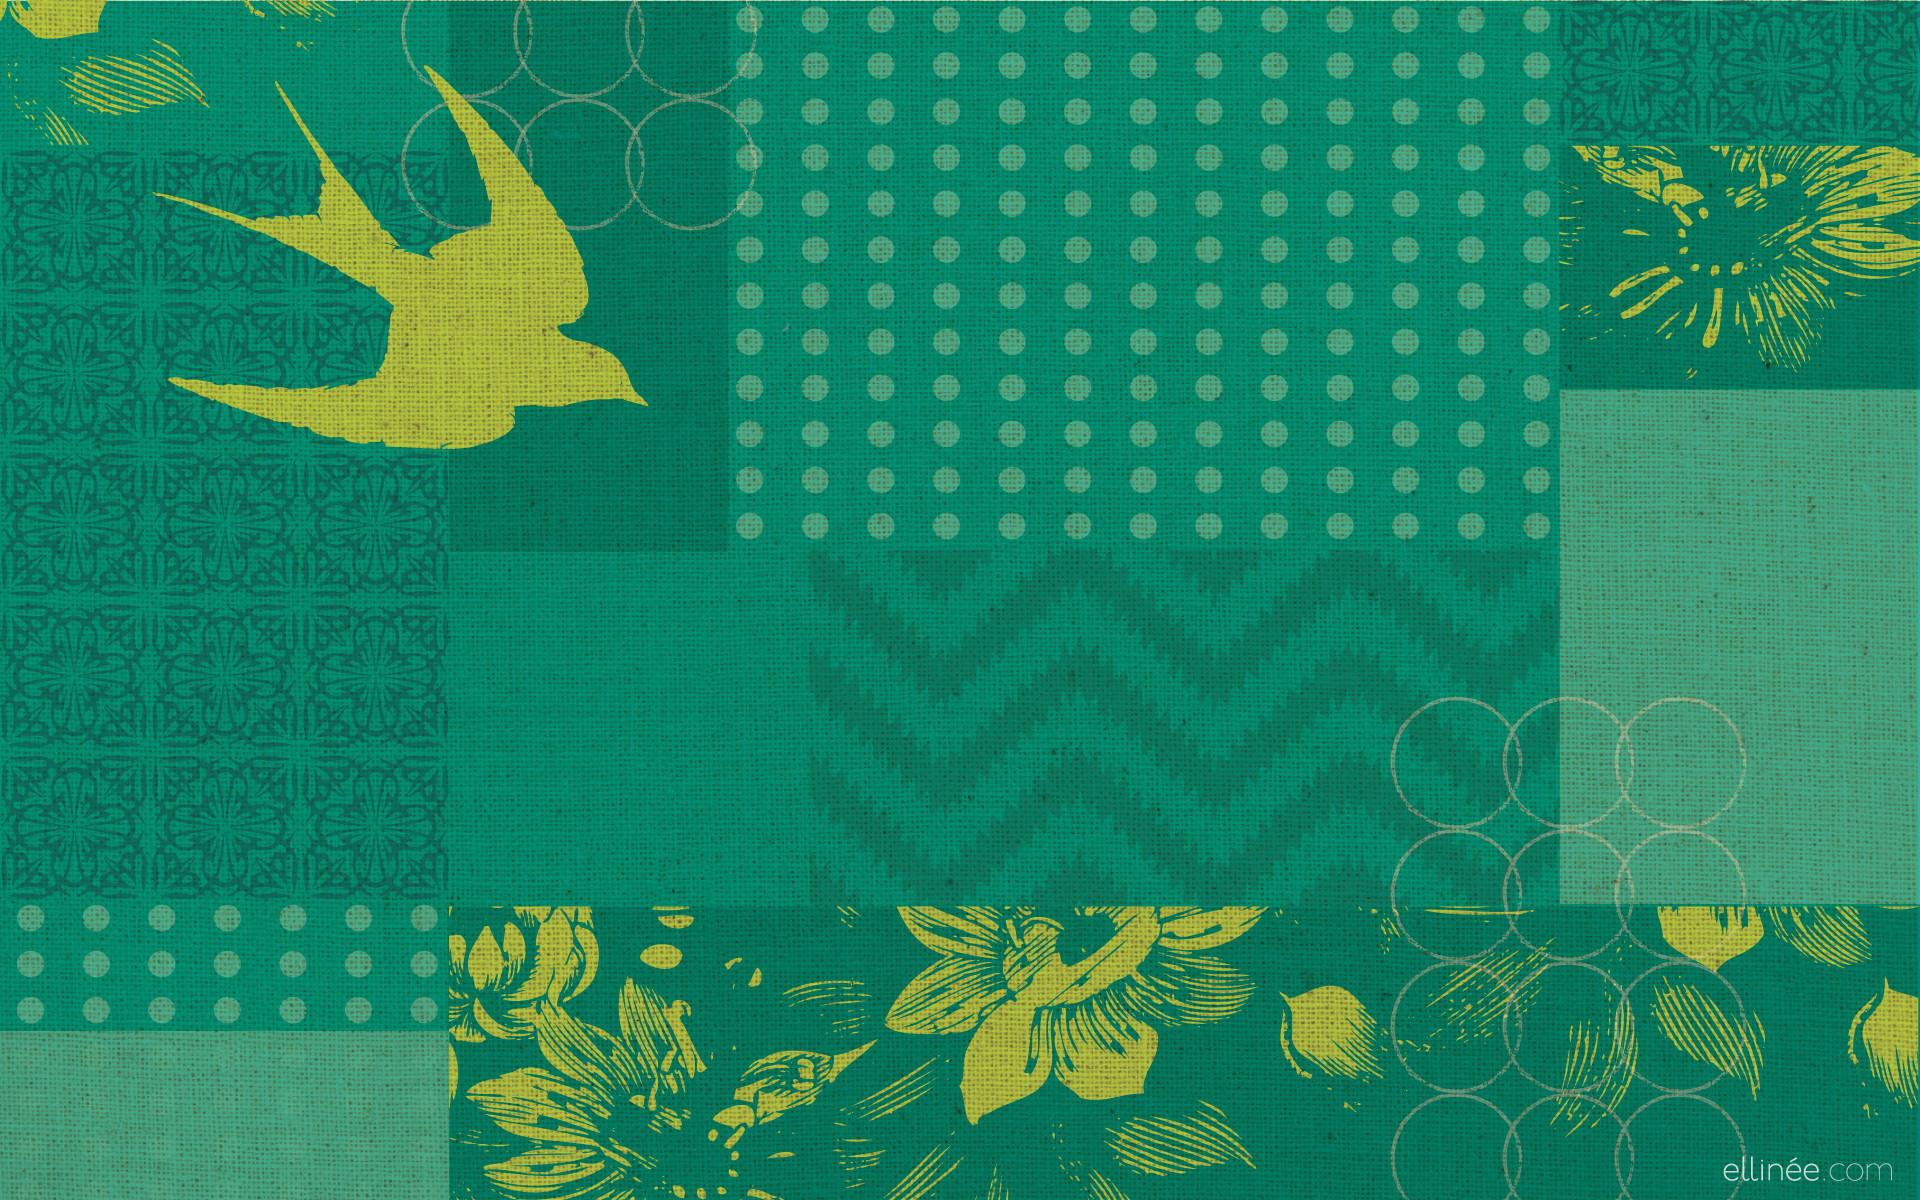 Green Lantern Computer Wallpapers, Desktop Backgrounds   1920×1080 .